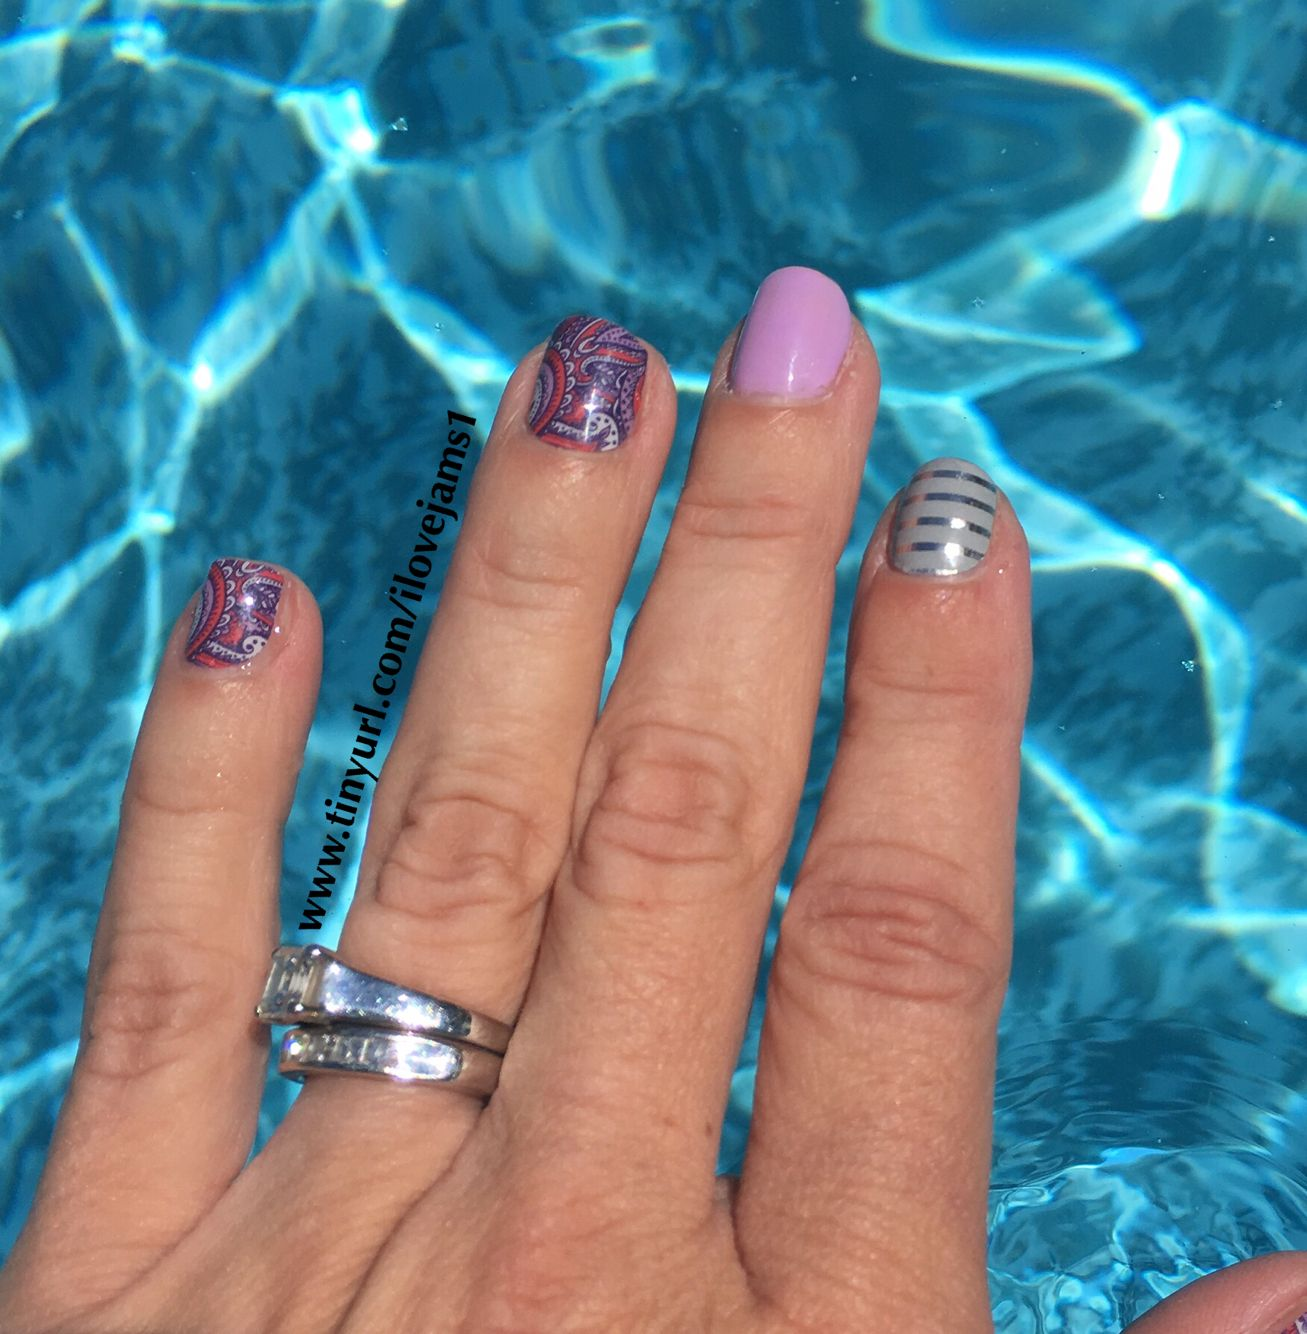 Swimming all day and my Jamberry nails still look gorgeous! #shesunavailablejn #junehejn #grayandsilverhorizontalstripejn